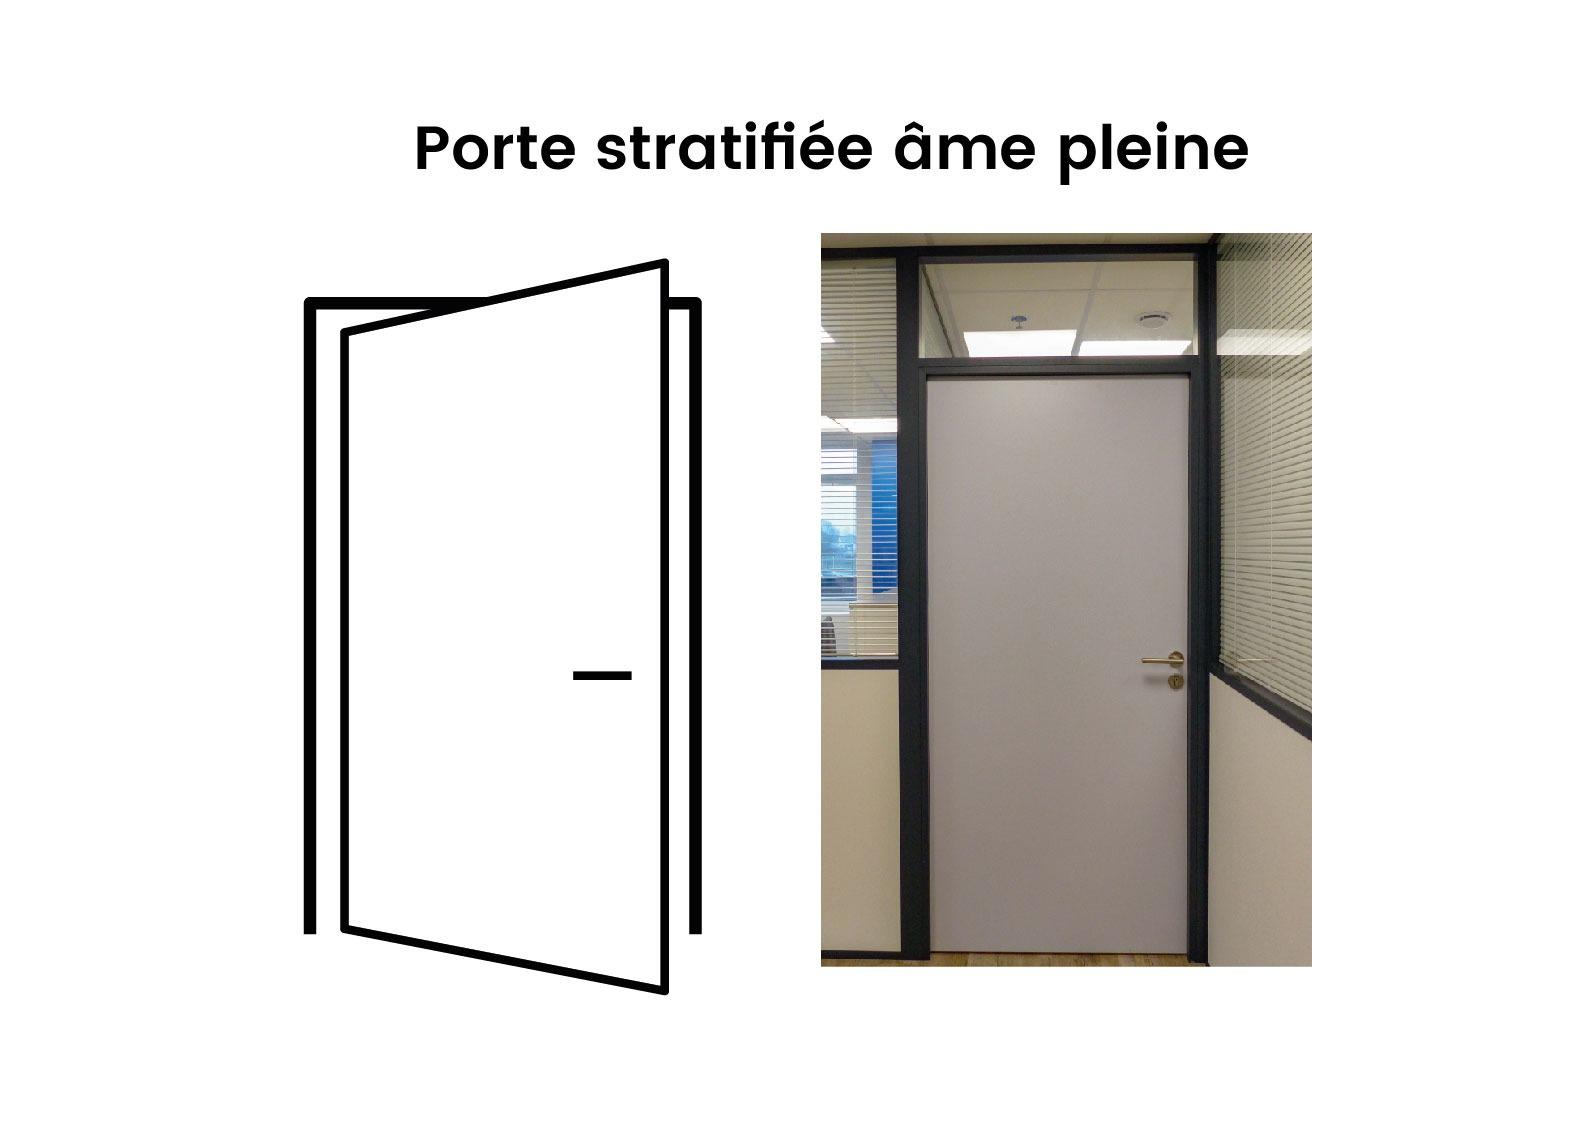 Porte Pleine Stratifie Ame Pleine Langlois Sobreti 03